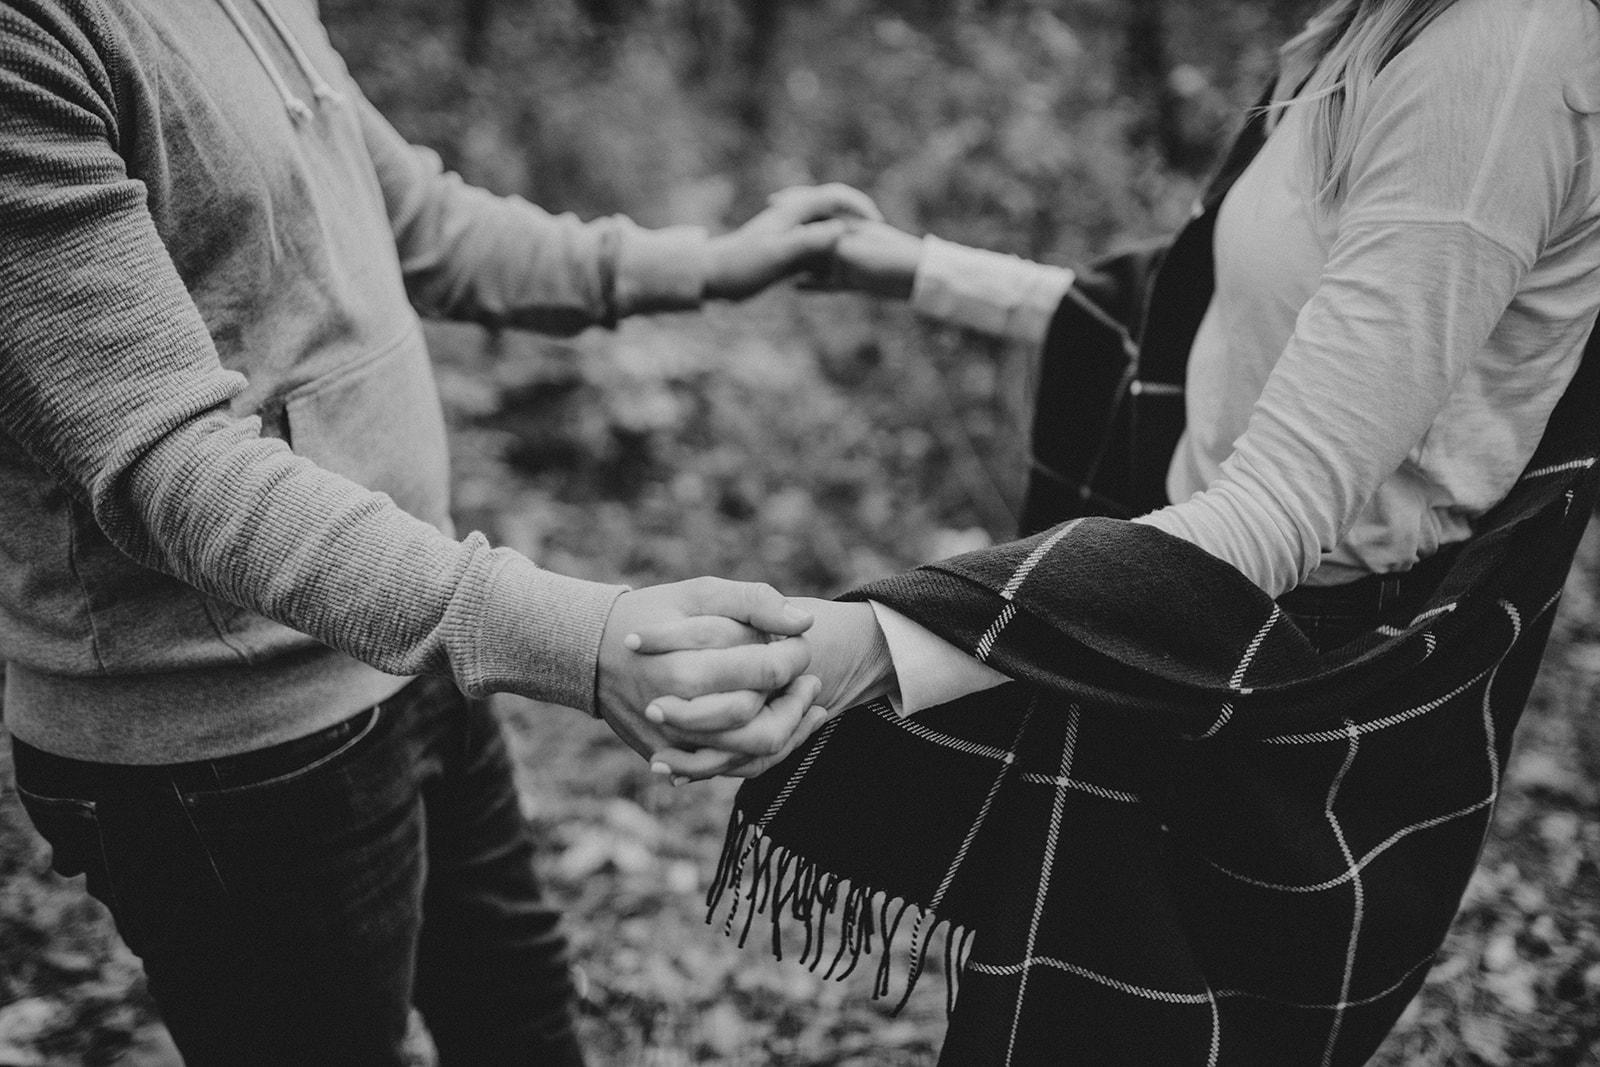 couple inter-locking fingers